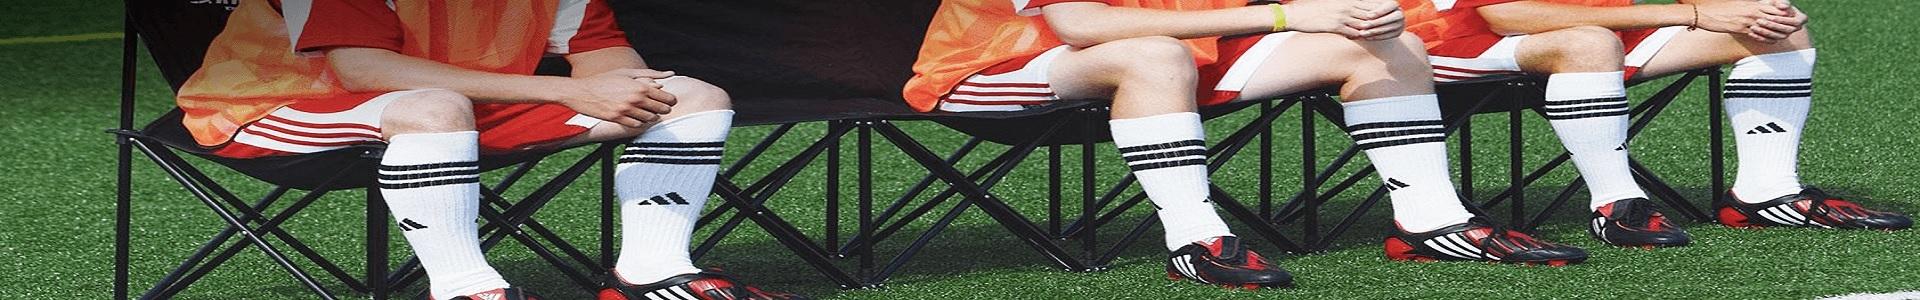 ExtraOffre Sport Banner Kids Clothing Underwears Socks Category